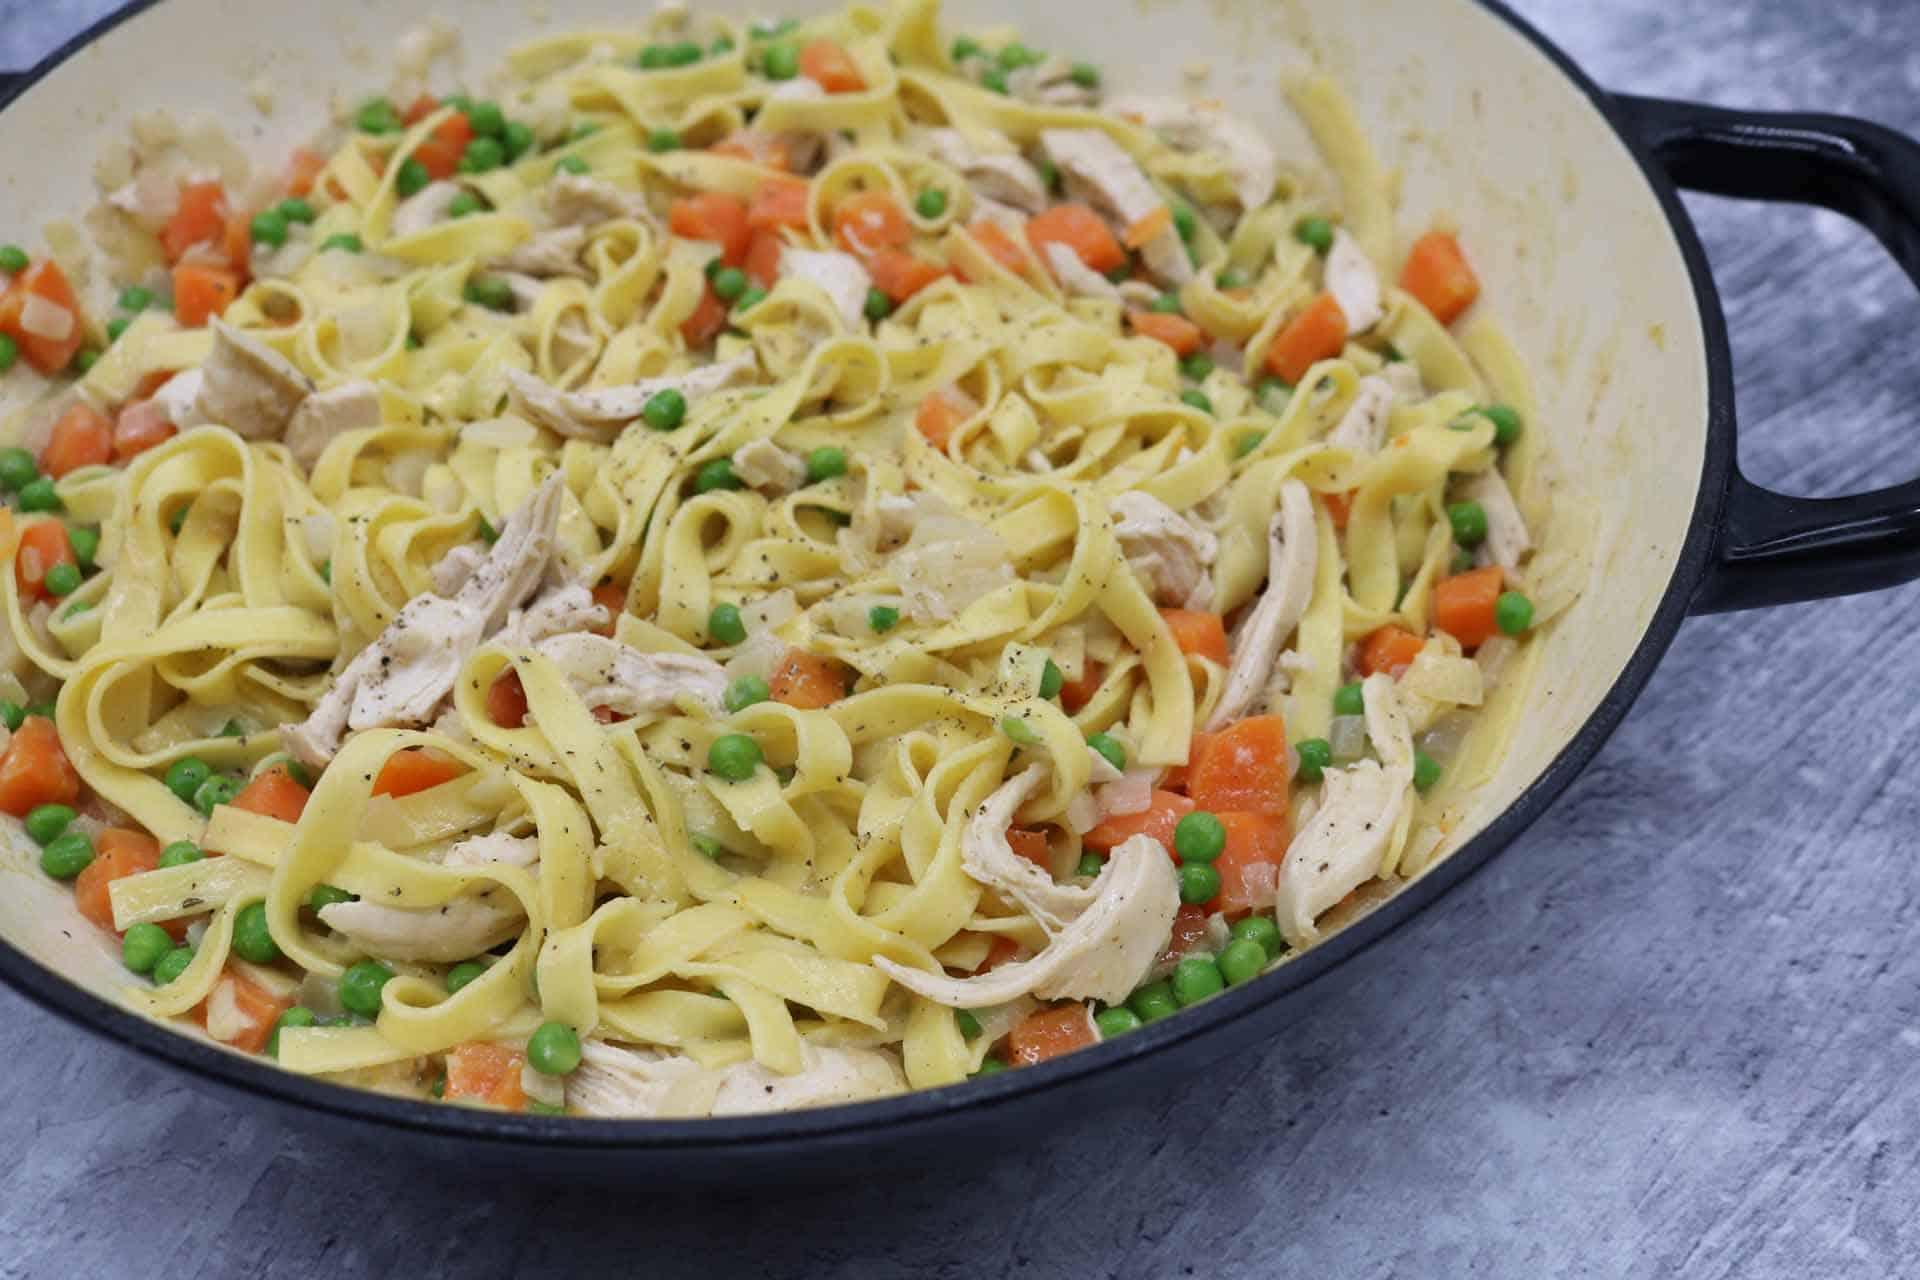 Creamy Chicken and Vegetable Tagliatelle, Creamy Chicken and Vegetable Tagliatelle